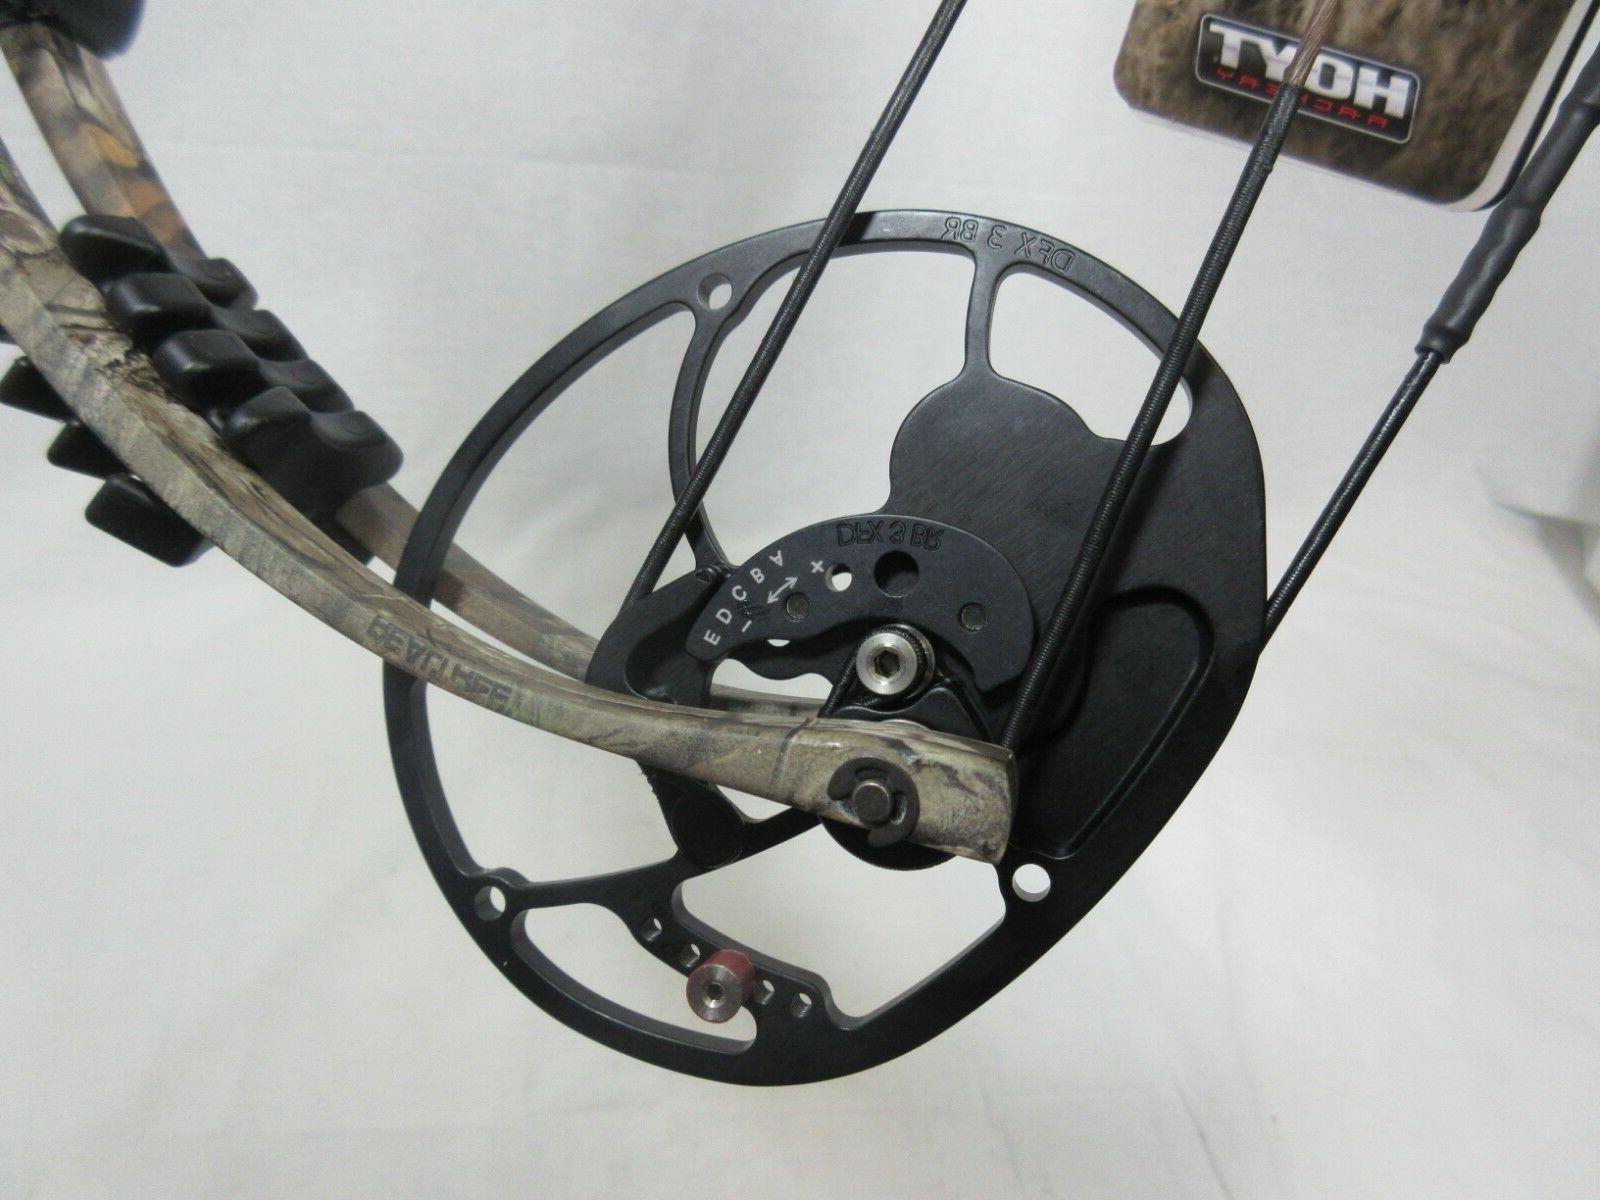 Compound Bow Xtra Camo Various options